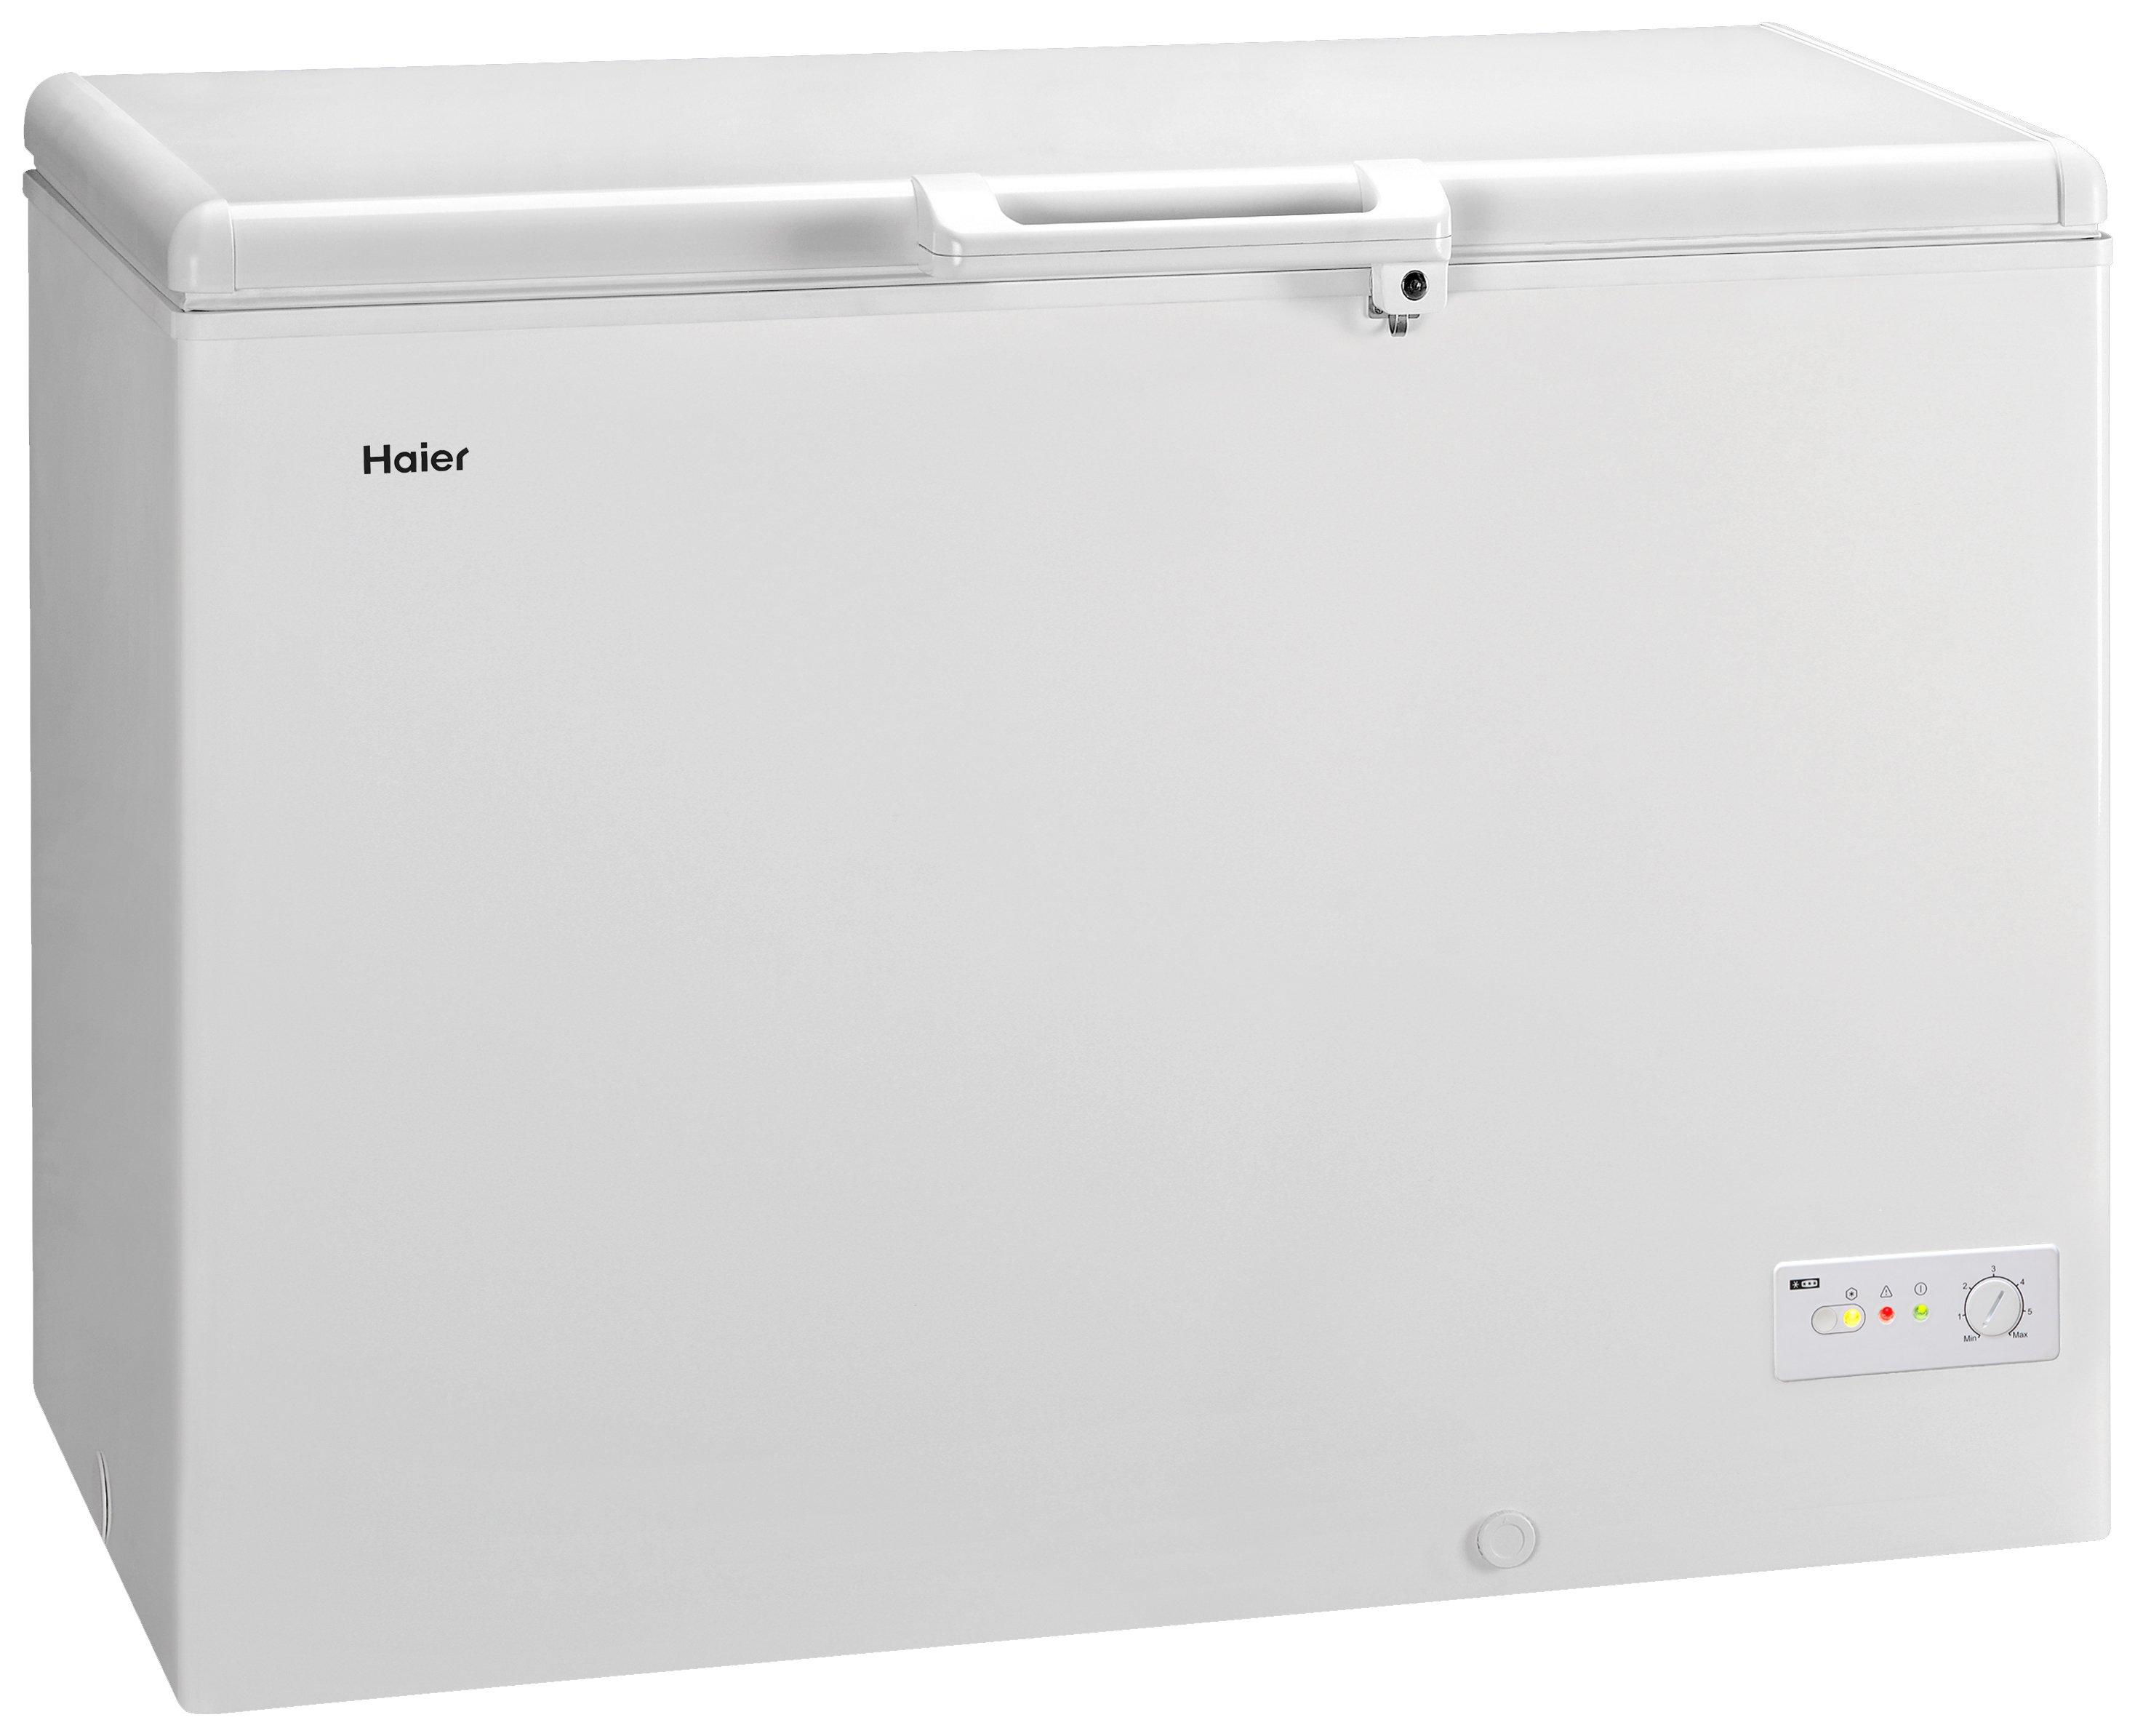 Image of Haier BD-319RAA Chest Freezer - White